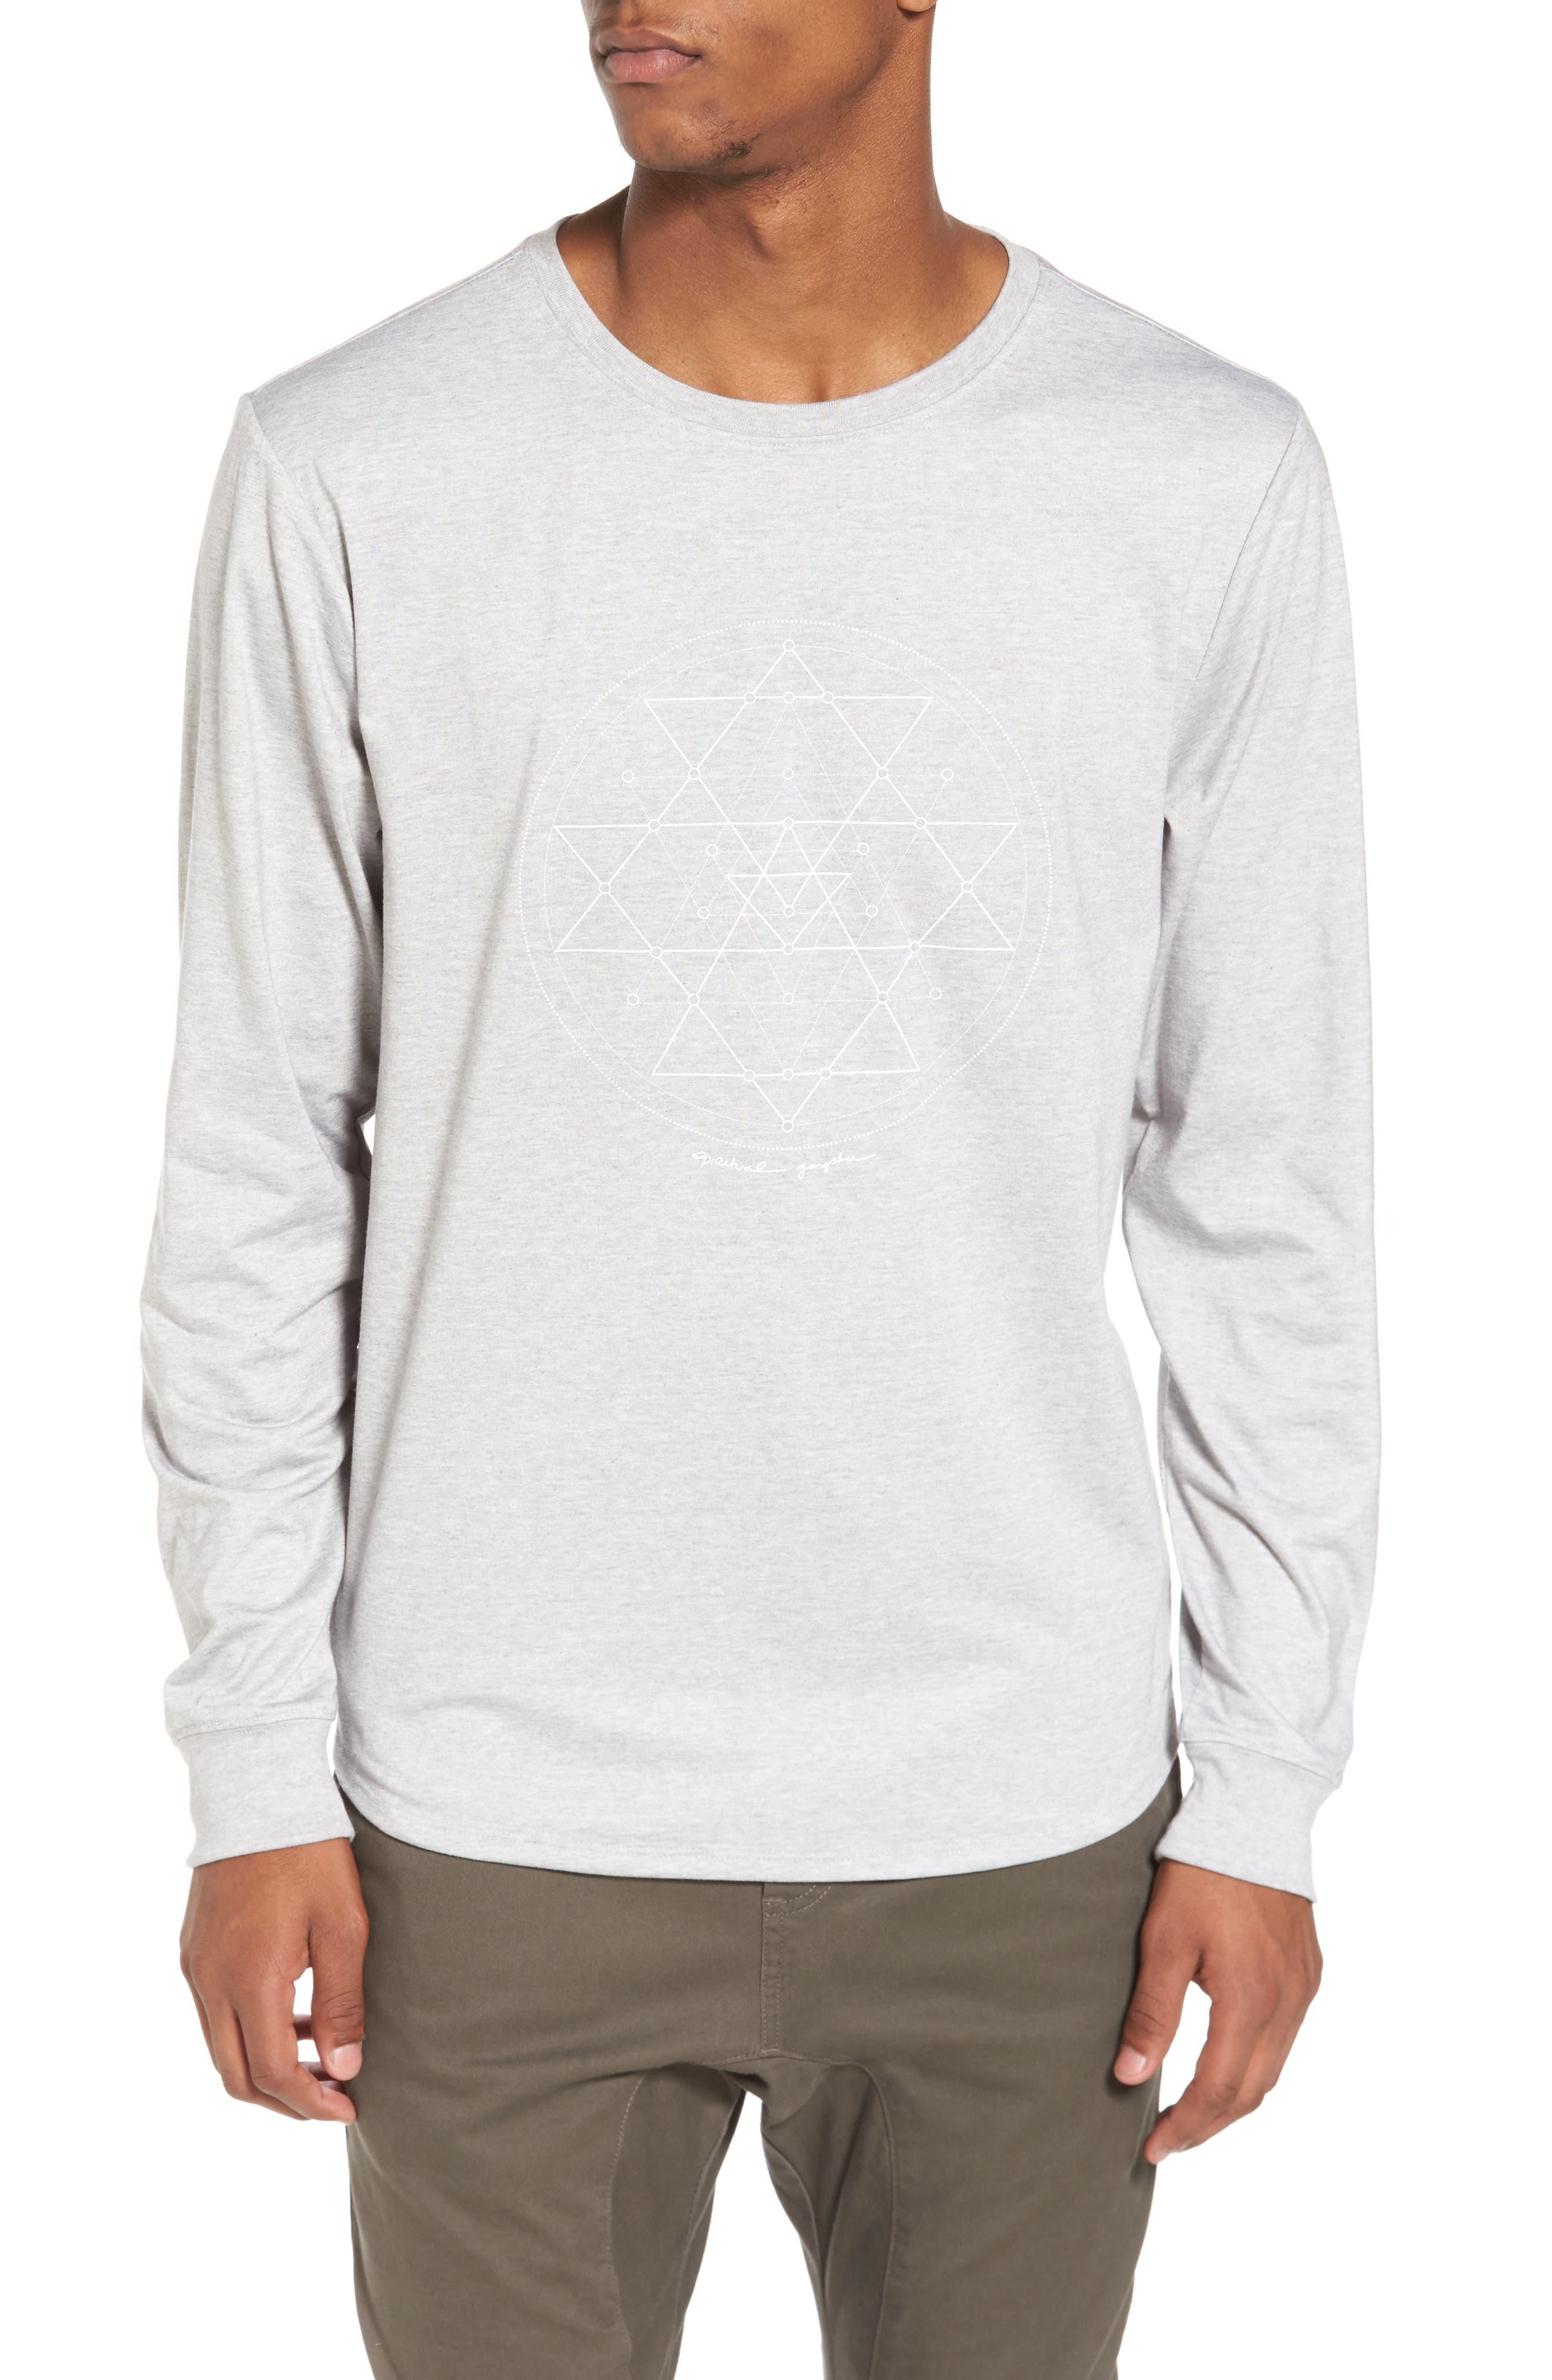 Yantra Long Sleeve T-Shirt,                             Main thumbnail 1, color,                             Heather Grey/ Heather Grey